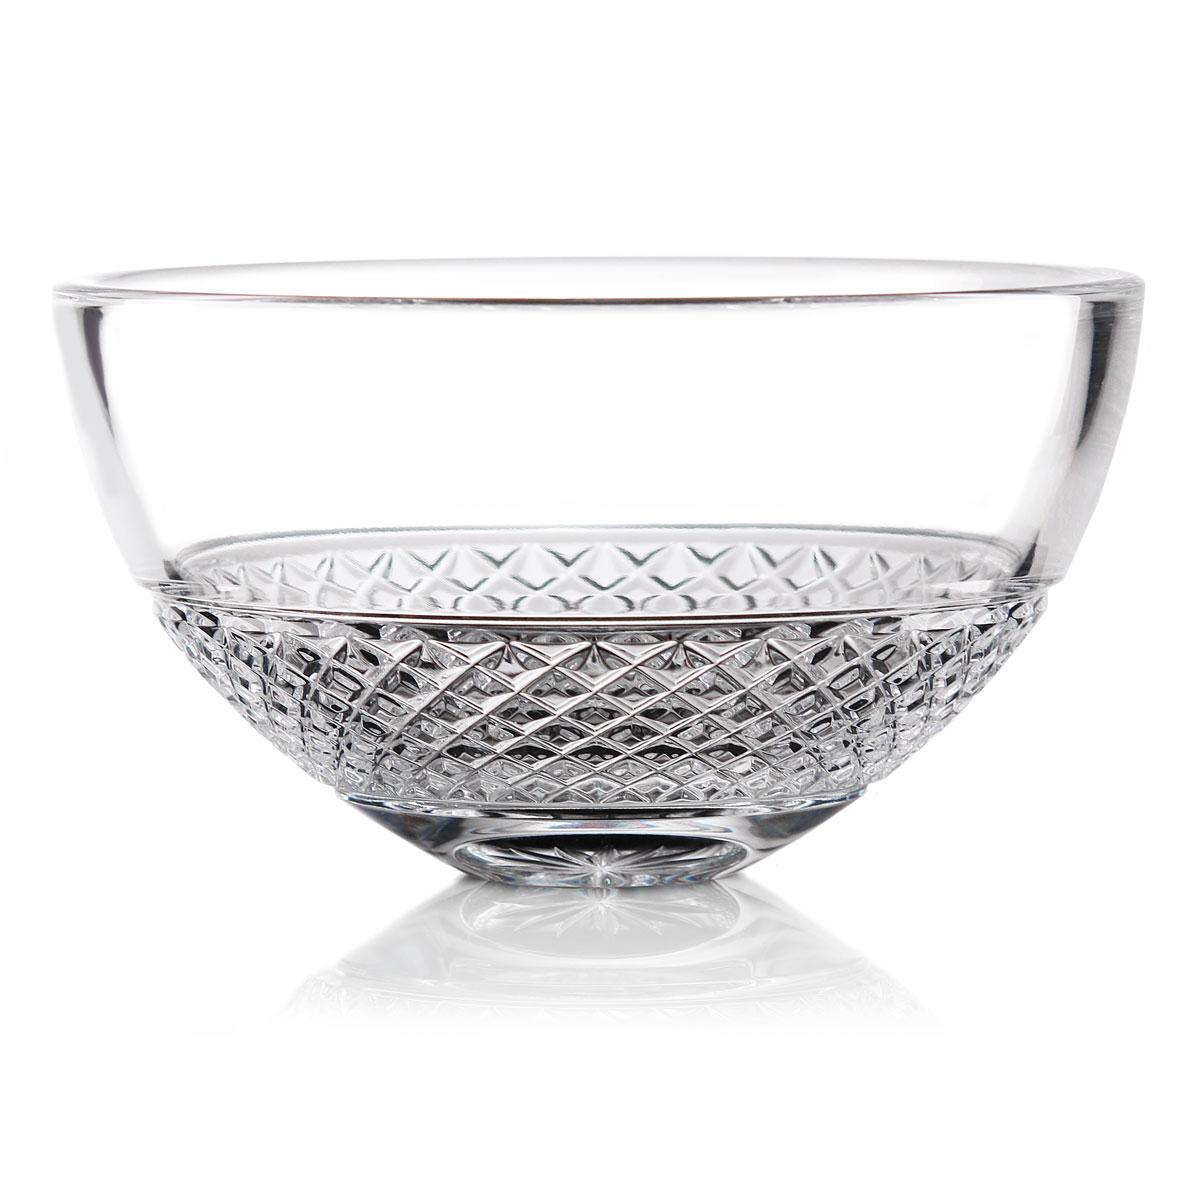 "Cashs Ireland, Cooper 10"" Crystal Bowl"